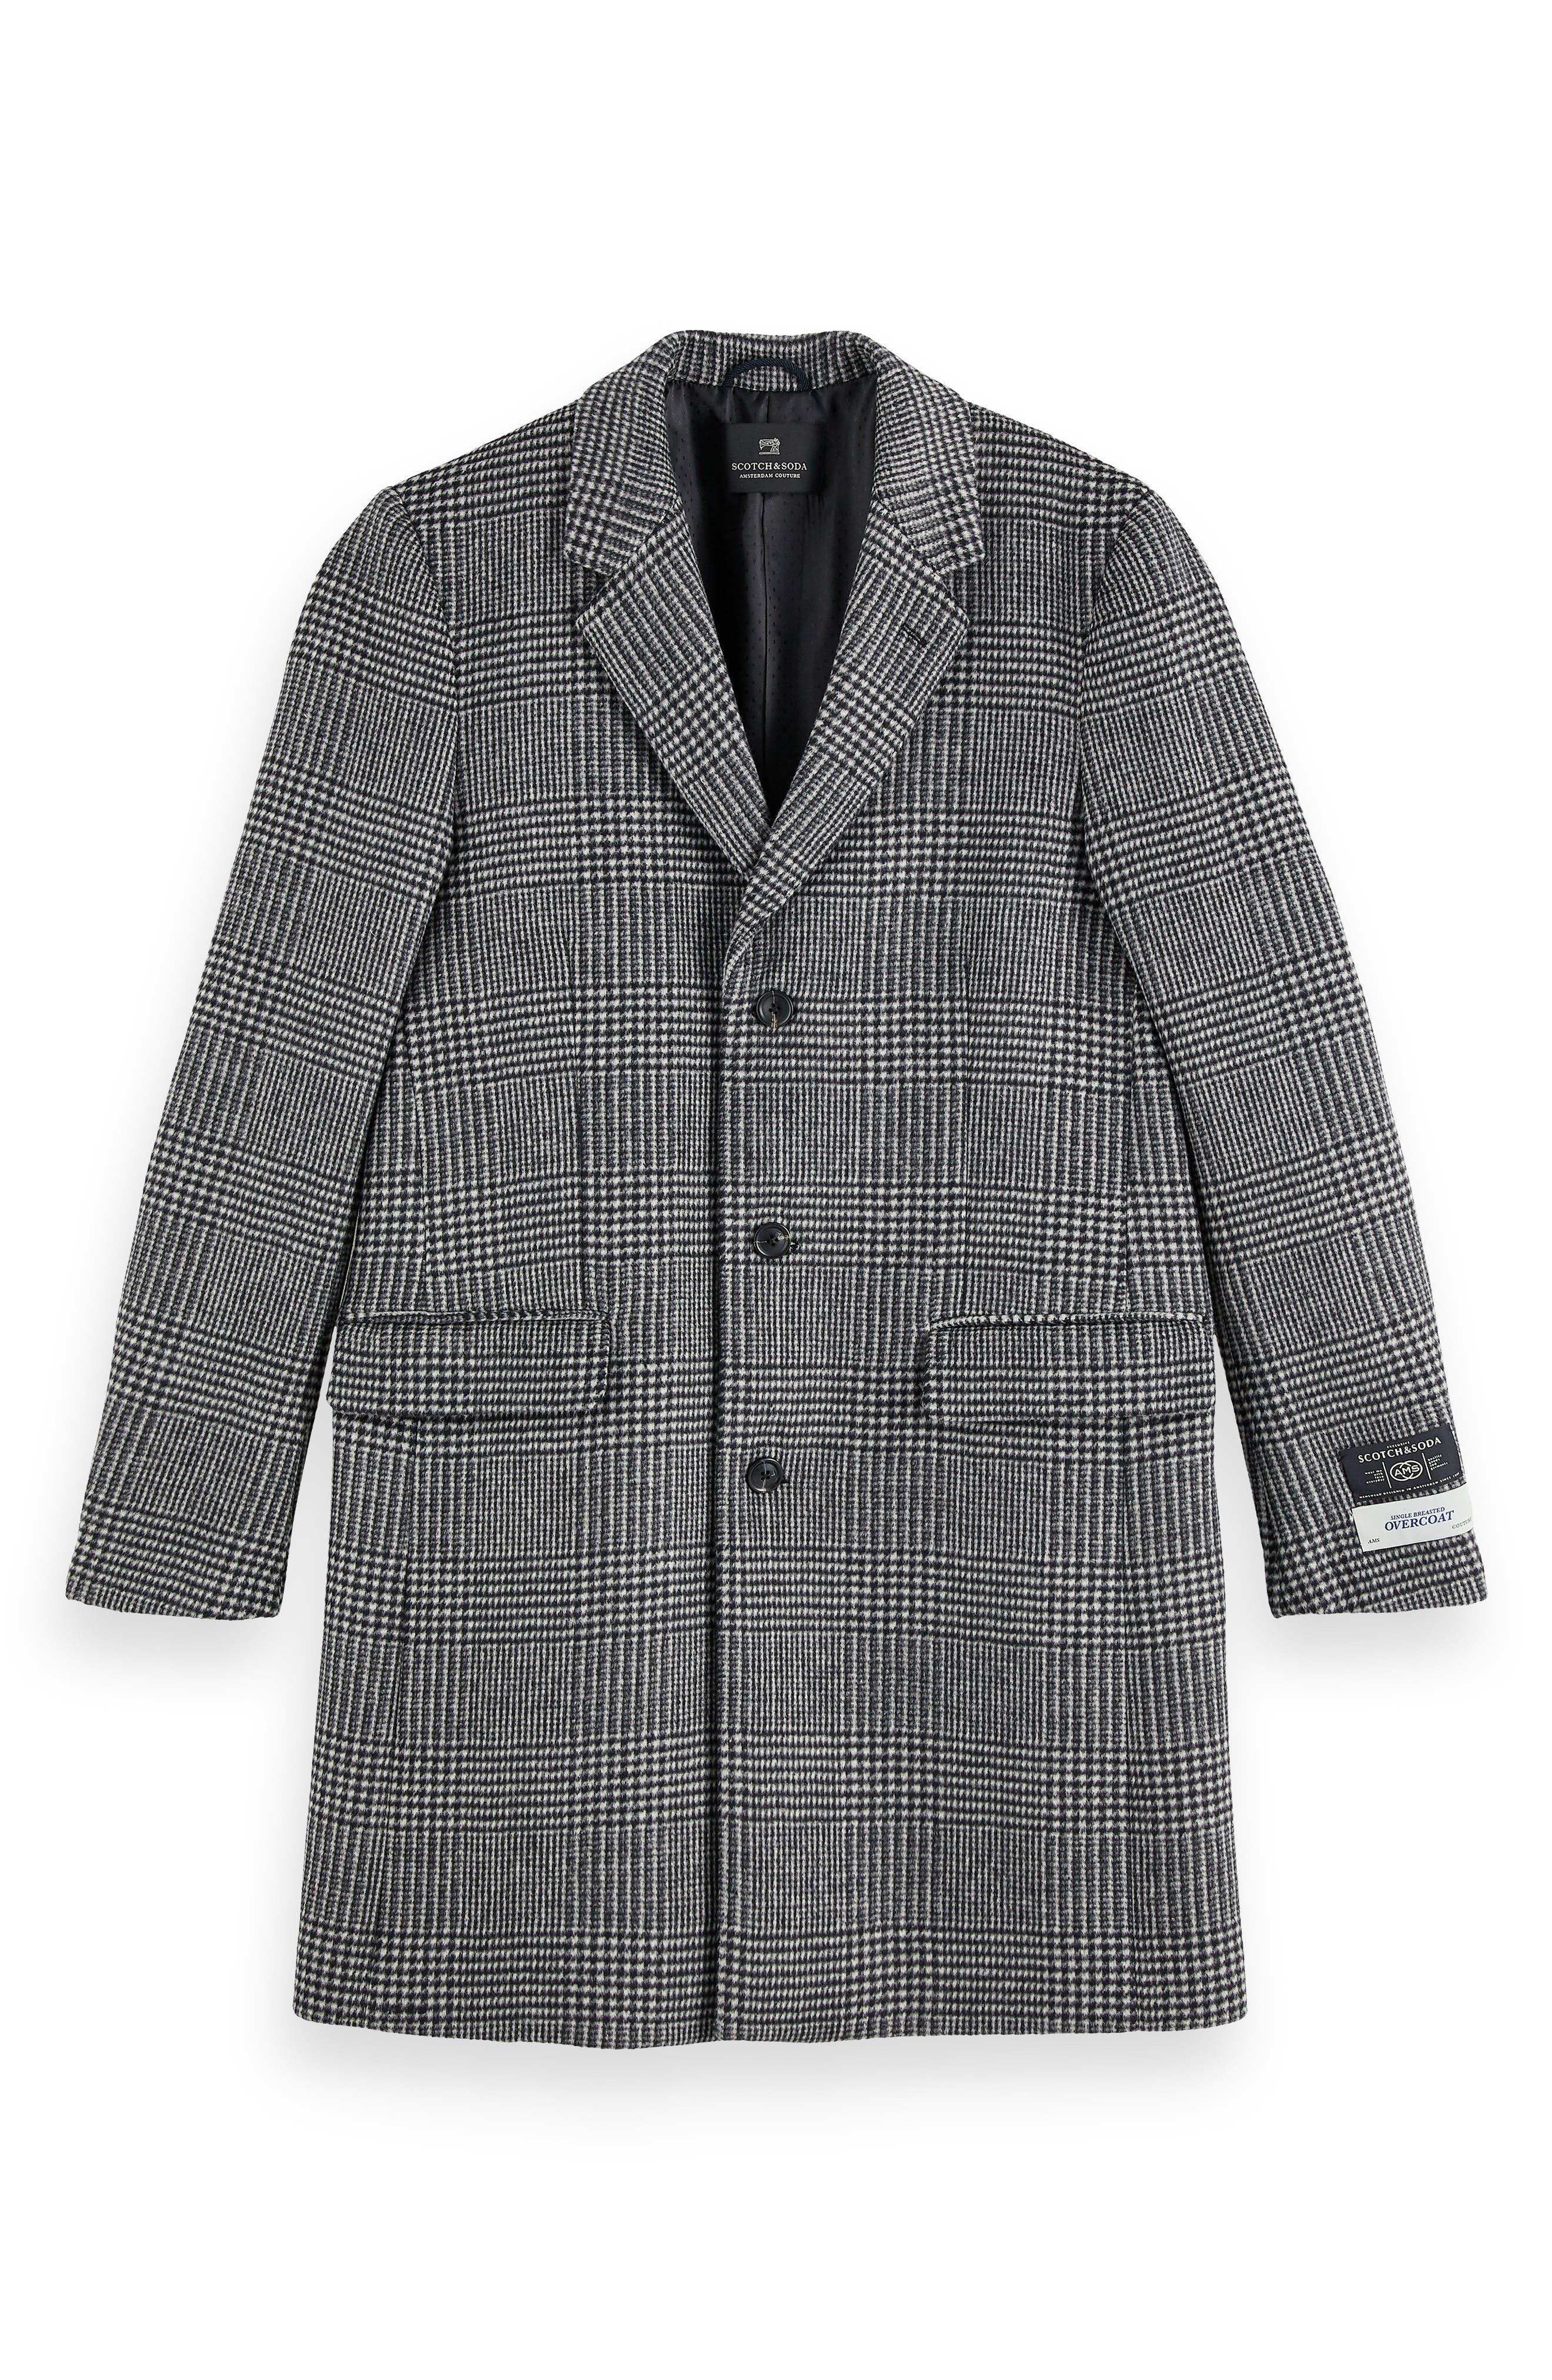 50s Men's Jackets | Greaser Jackets, Leather, Bomber, Gabardine Mens Scotch  Soda Houndstooth Plaid Overcoat Size Small - Grey $449.00 AT vintagedancer.com